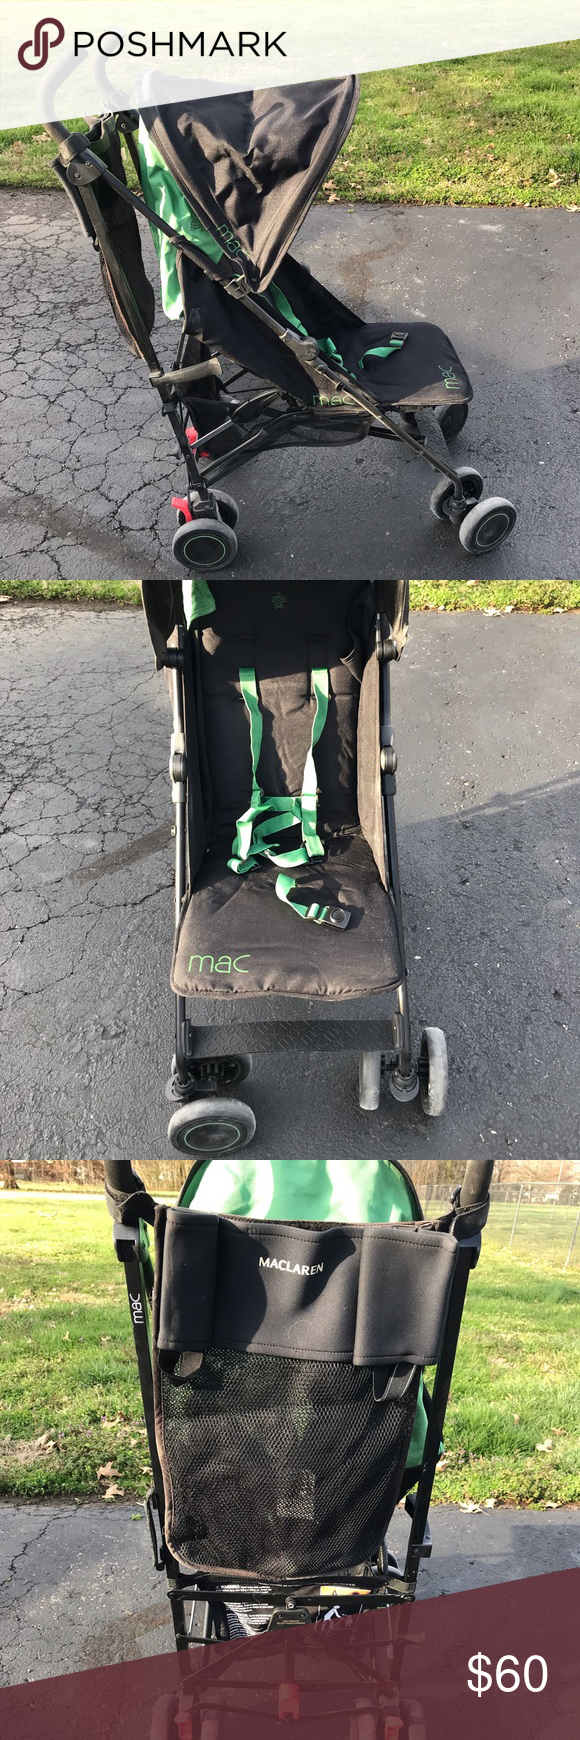 Mac stroller Stroller, Maclaren stroller, Compact strollers